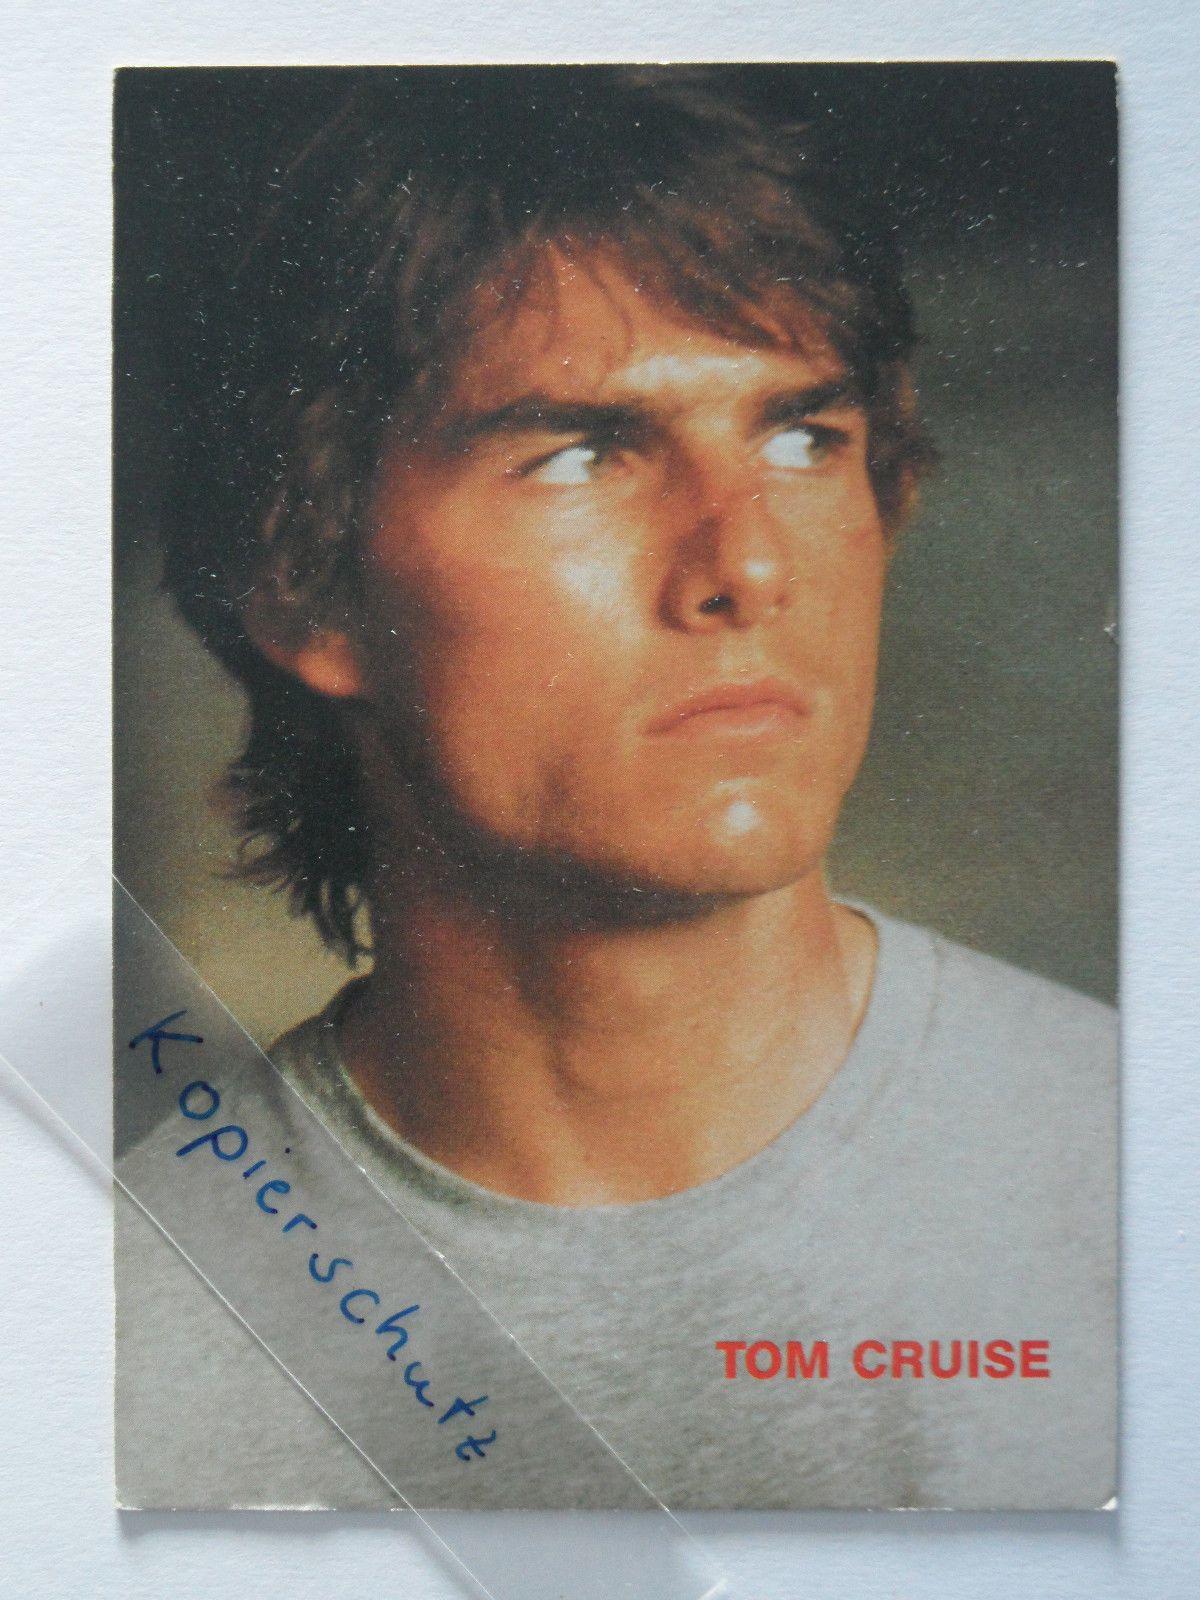 http://i.ebayimg.com/t/Tom-Cruise-unsignierte-Autogrammkarte-Ediposters-Nr-CR-0064-/00/s/MTYwMFgxMjAw/z/t6sAAOxy3zNSej9e/$(KGrHqJHJFUFJ6LJwO...